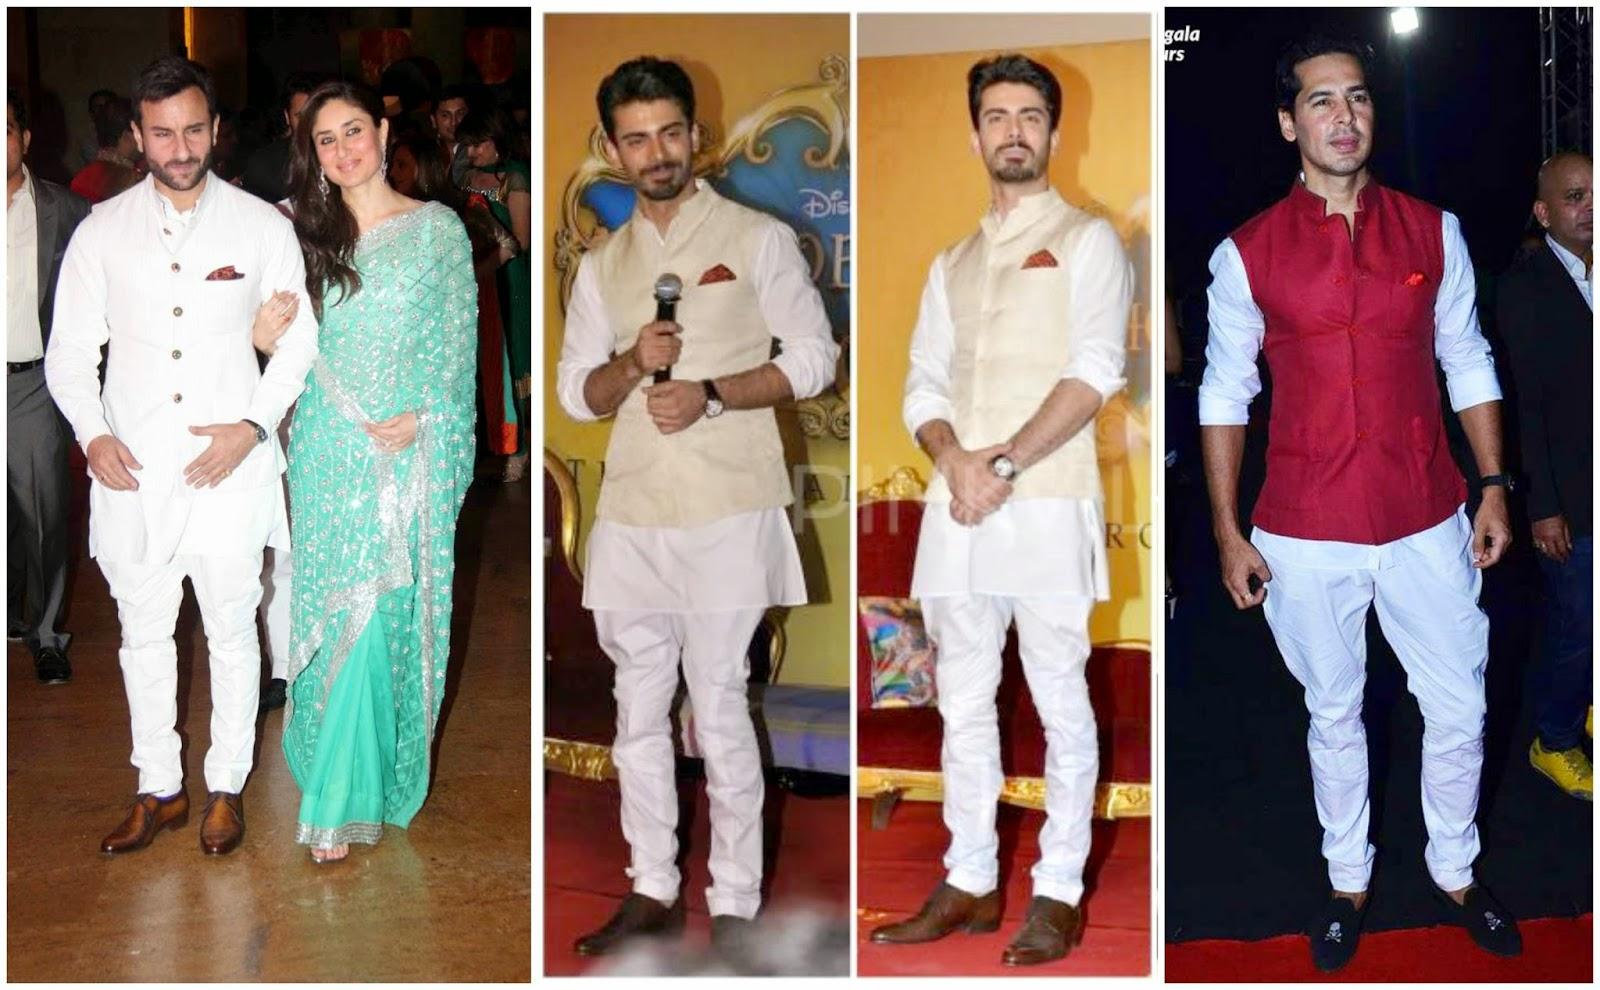 Raghavendra Rathore Designs of Waistcoat Sets, Saif Ali Khan in waistcoat set, Fawad Khan in Raghavendra Rathore, Dino in waistcoat set